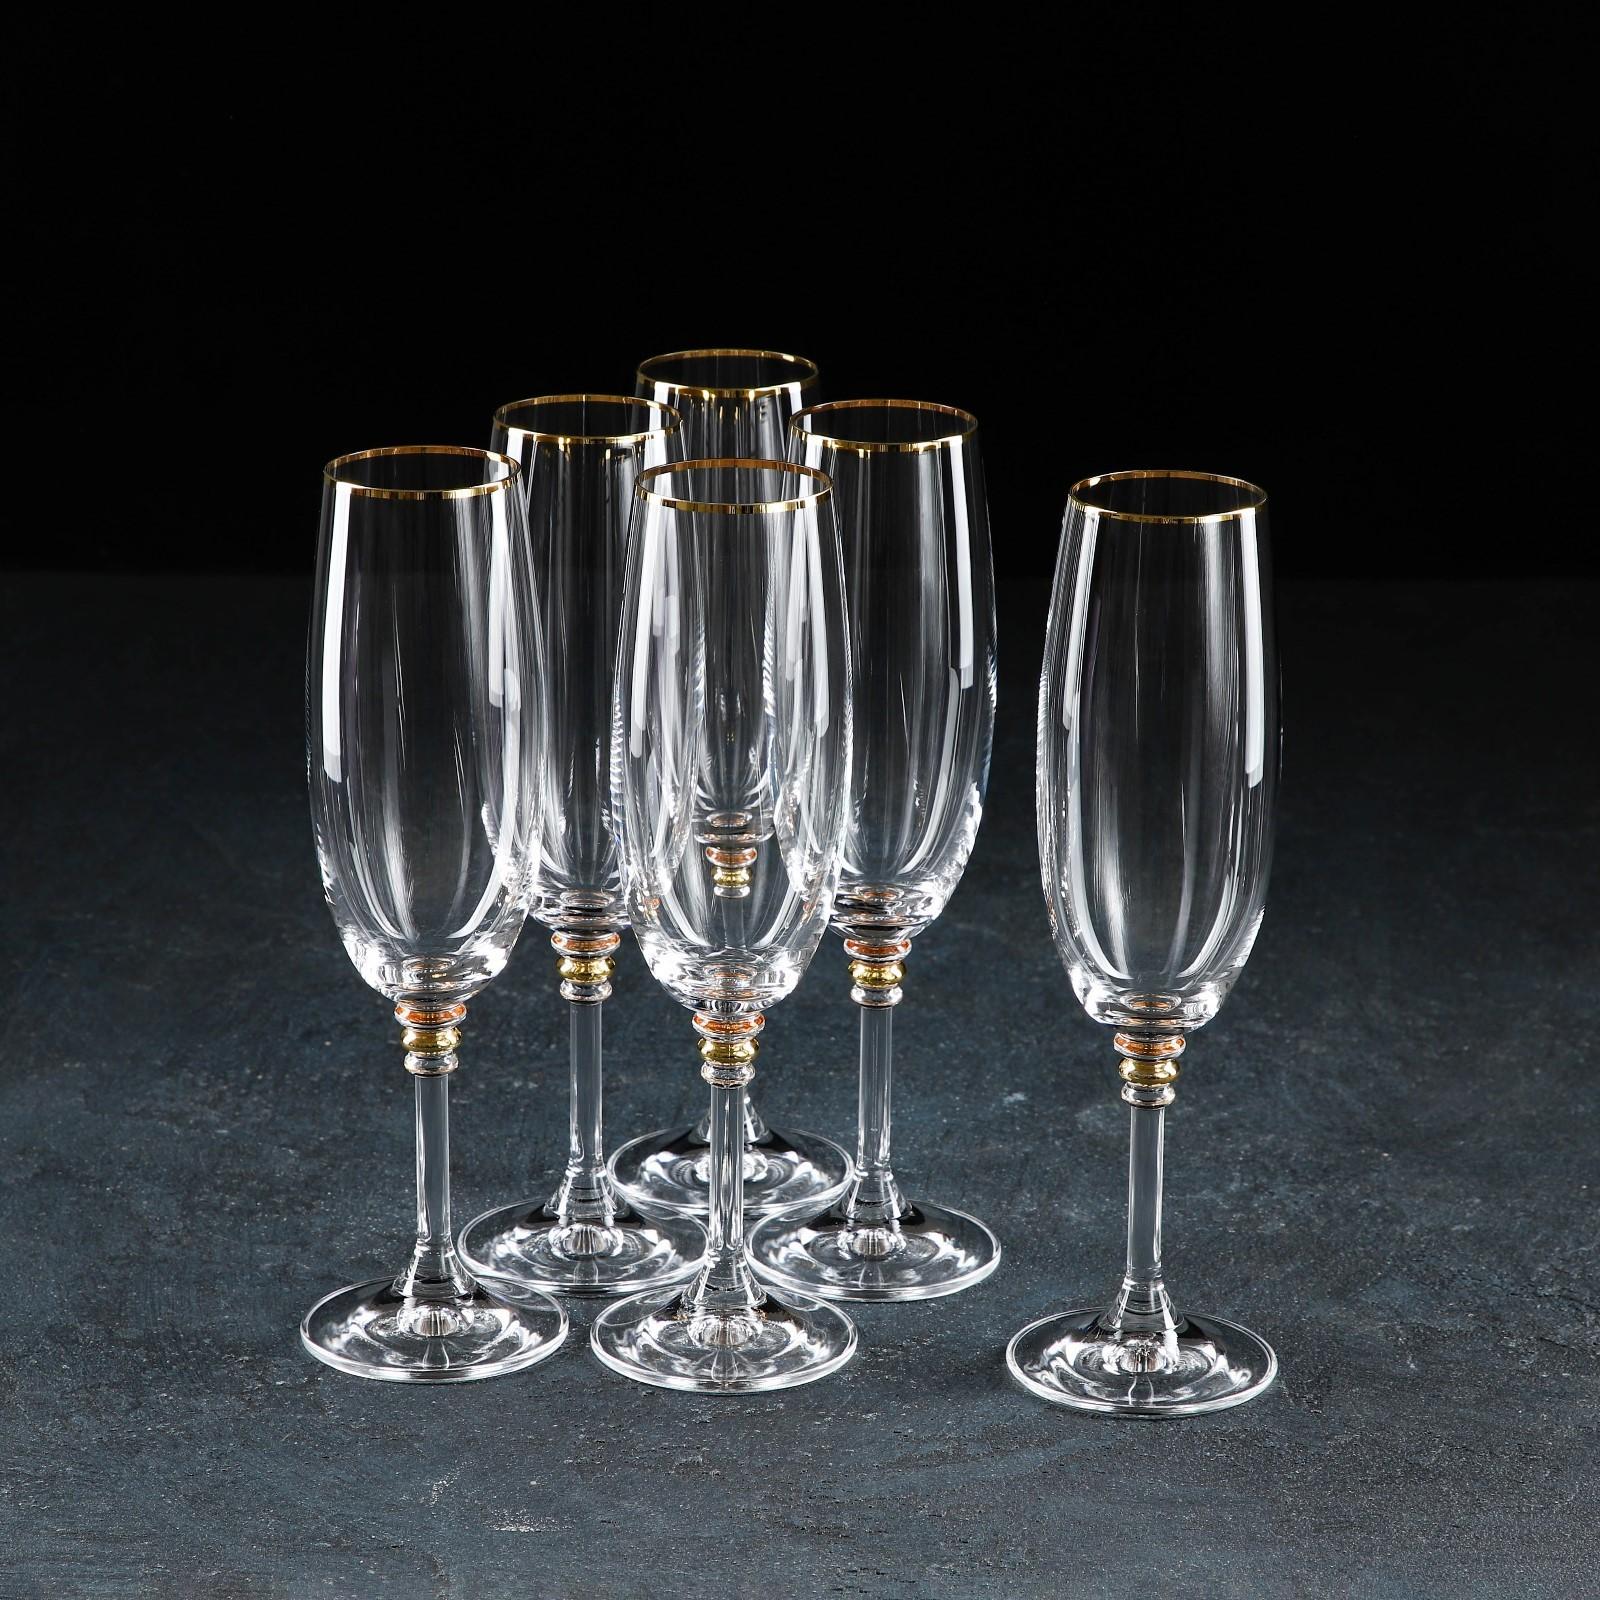 5070f28c2151 Набор бокалов для шампанского 190 мл